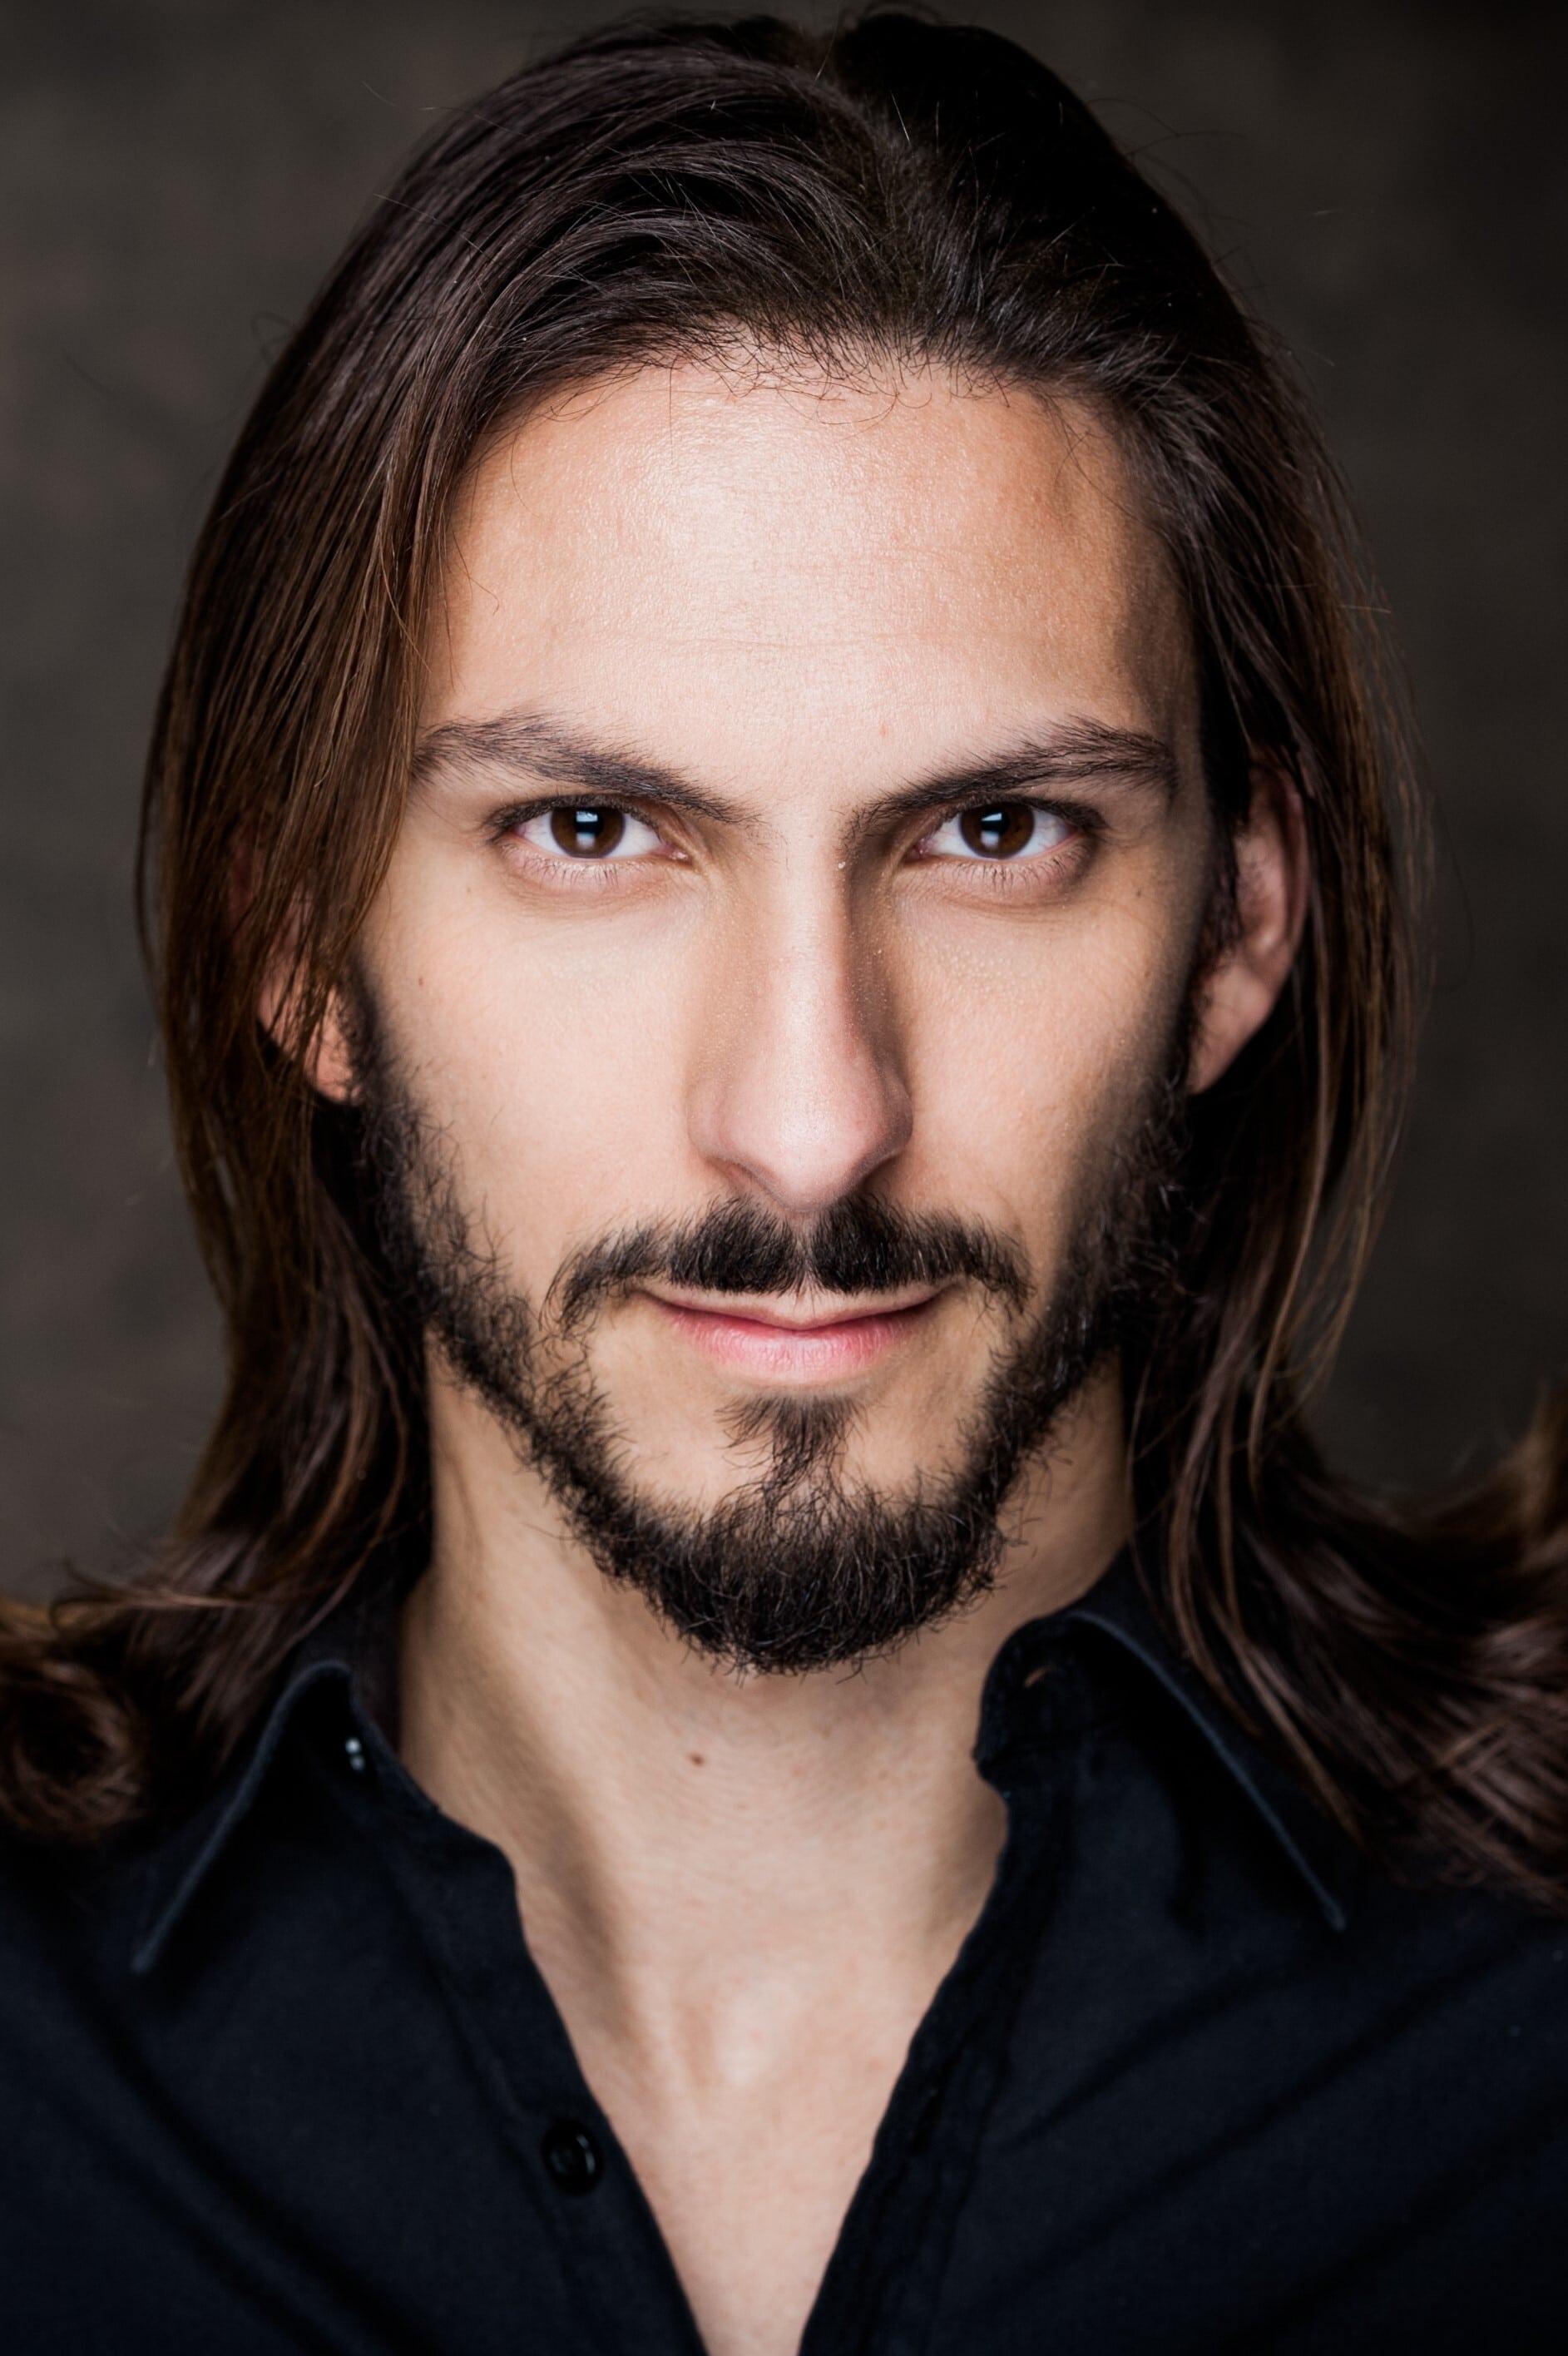 Dylan Saccoccio